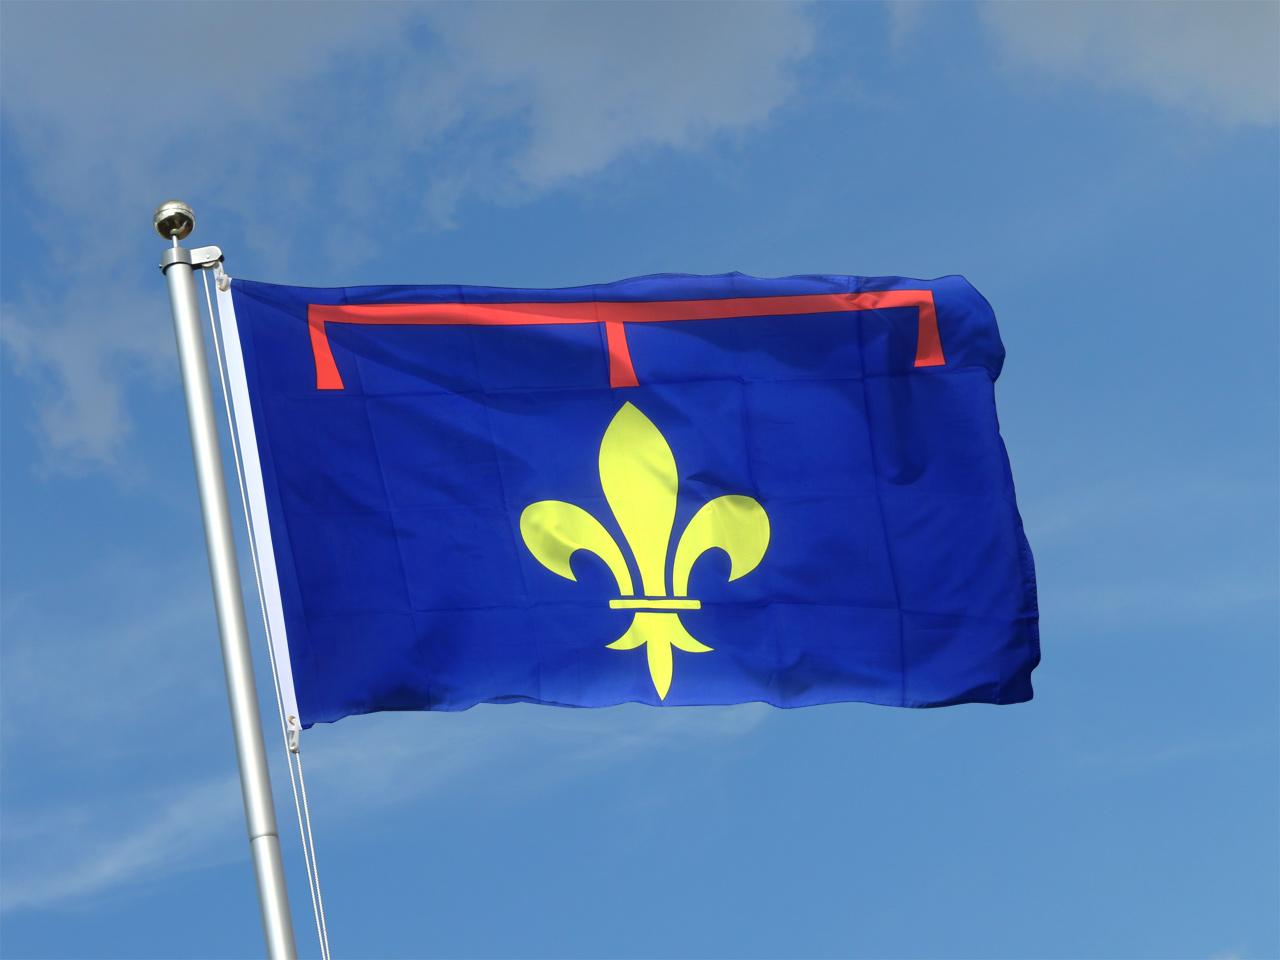 Provence fahne kaufen 90 x 150 cm Dekoration frankreich